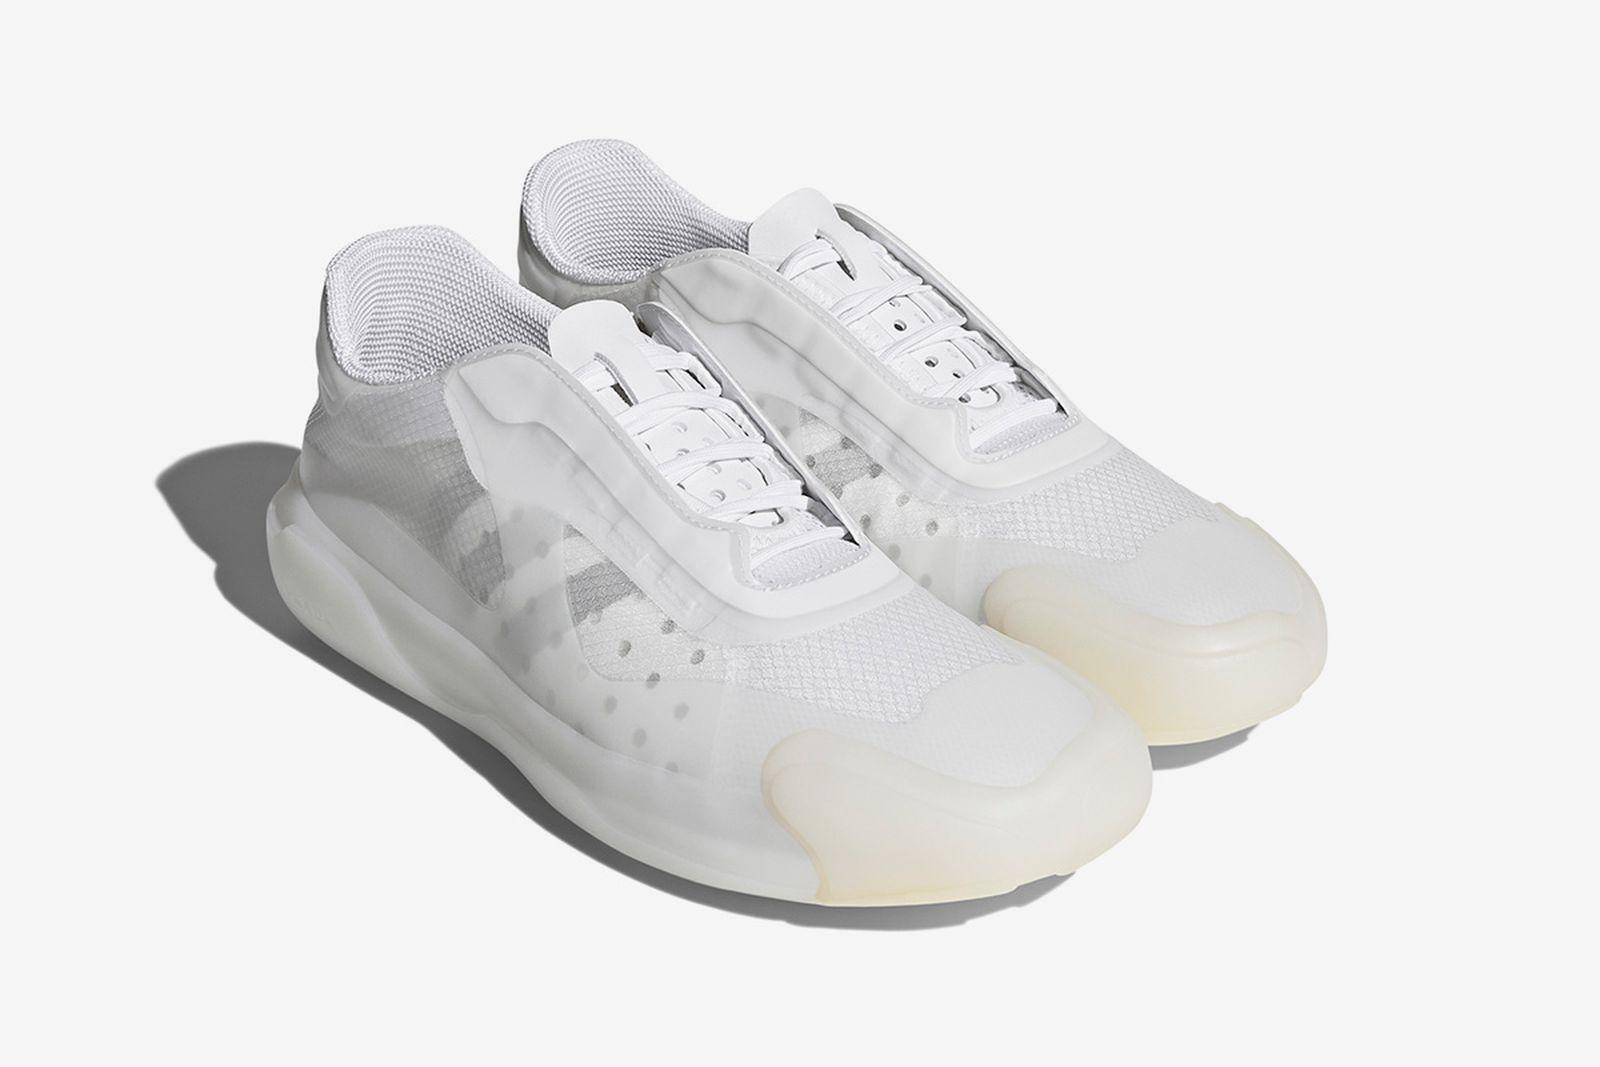 prada-adidas-ap-luna-rossa-21-release-date-price-06